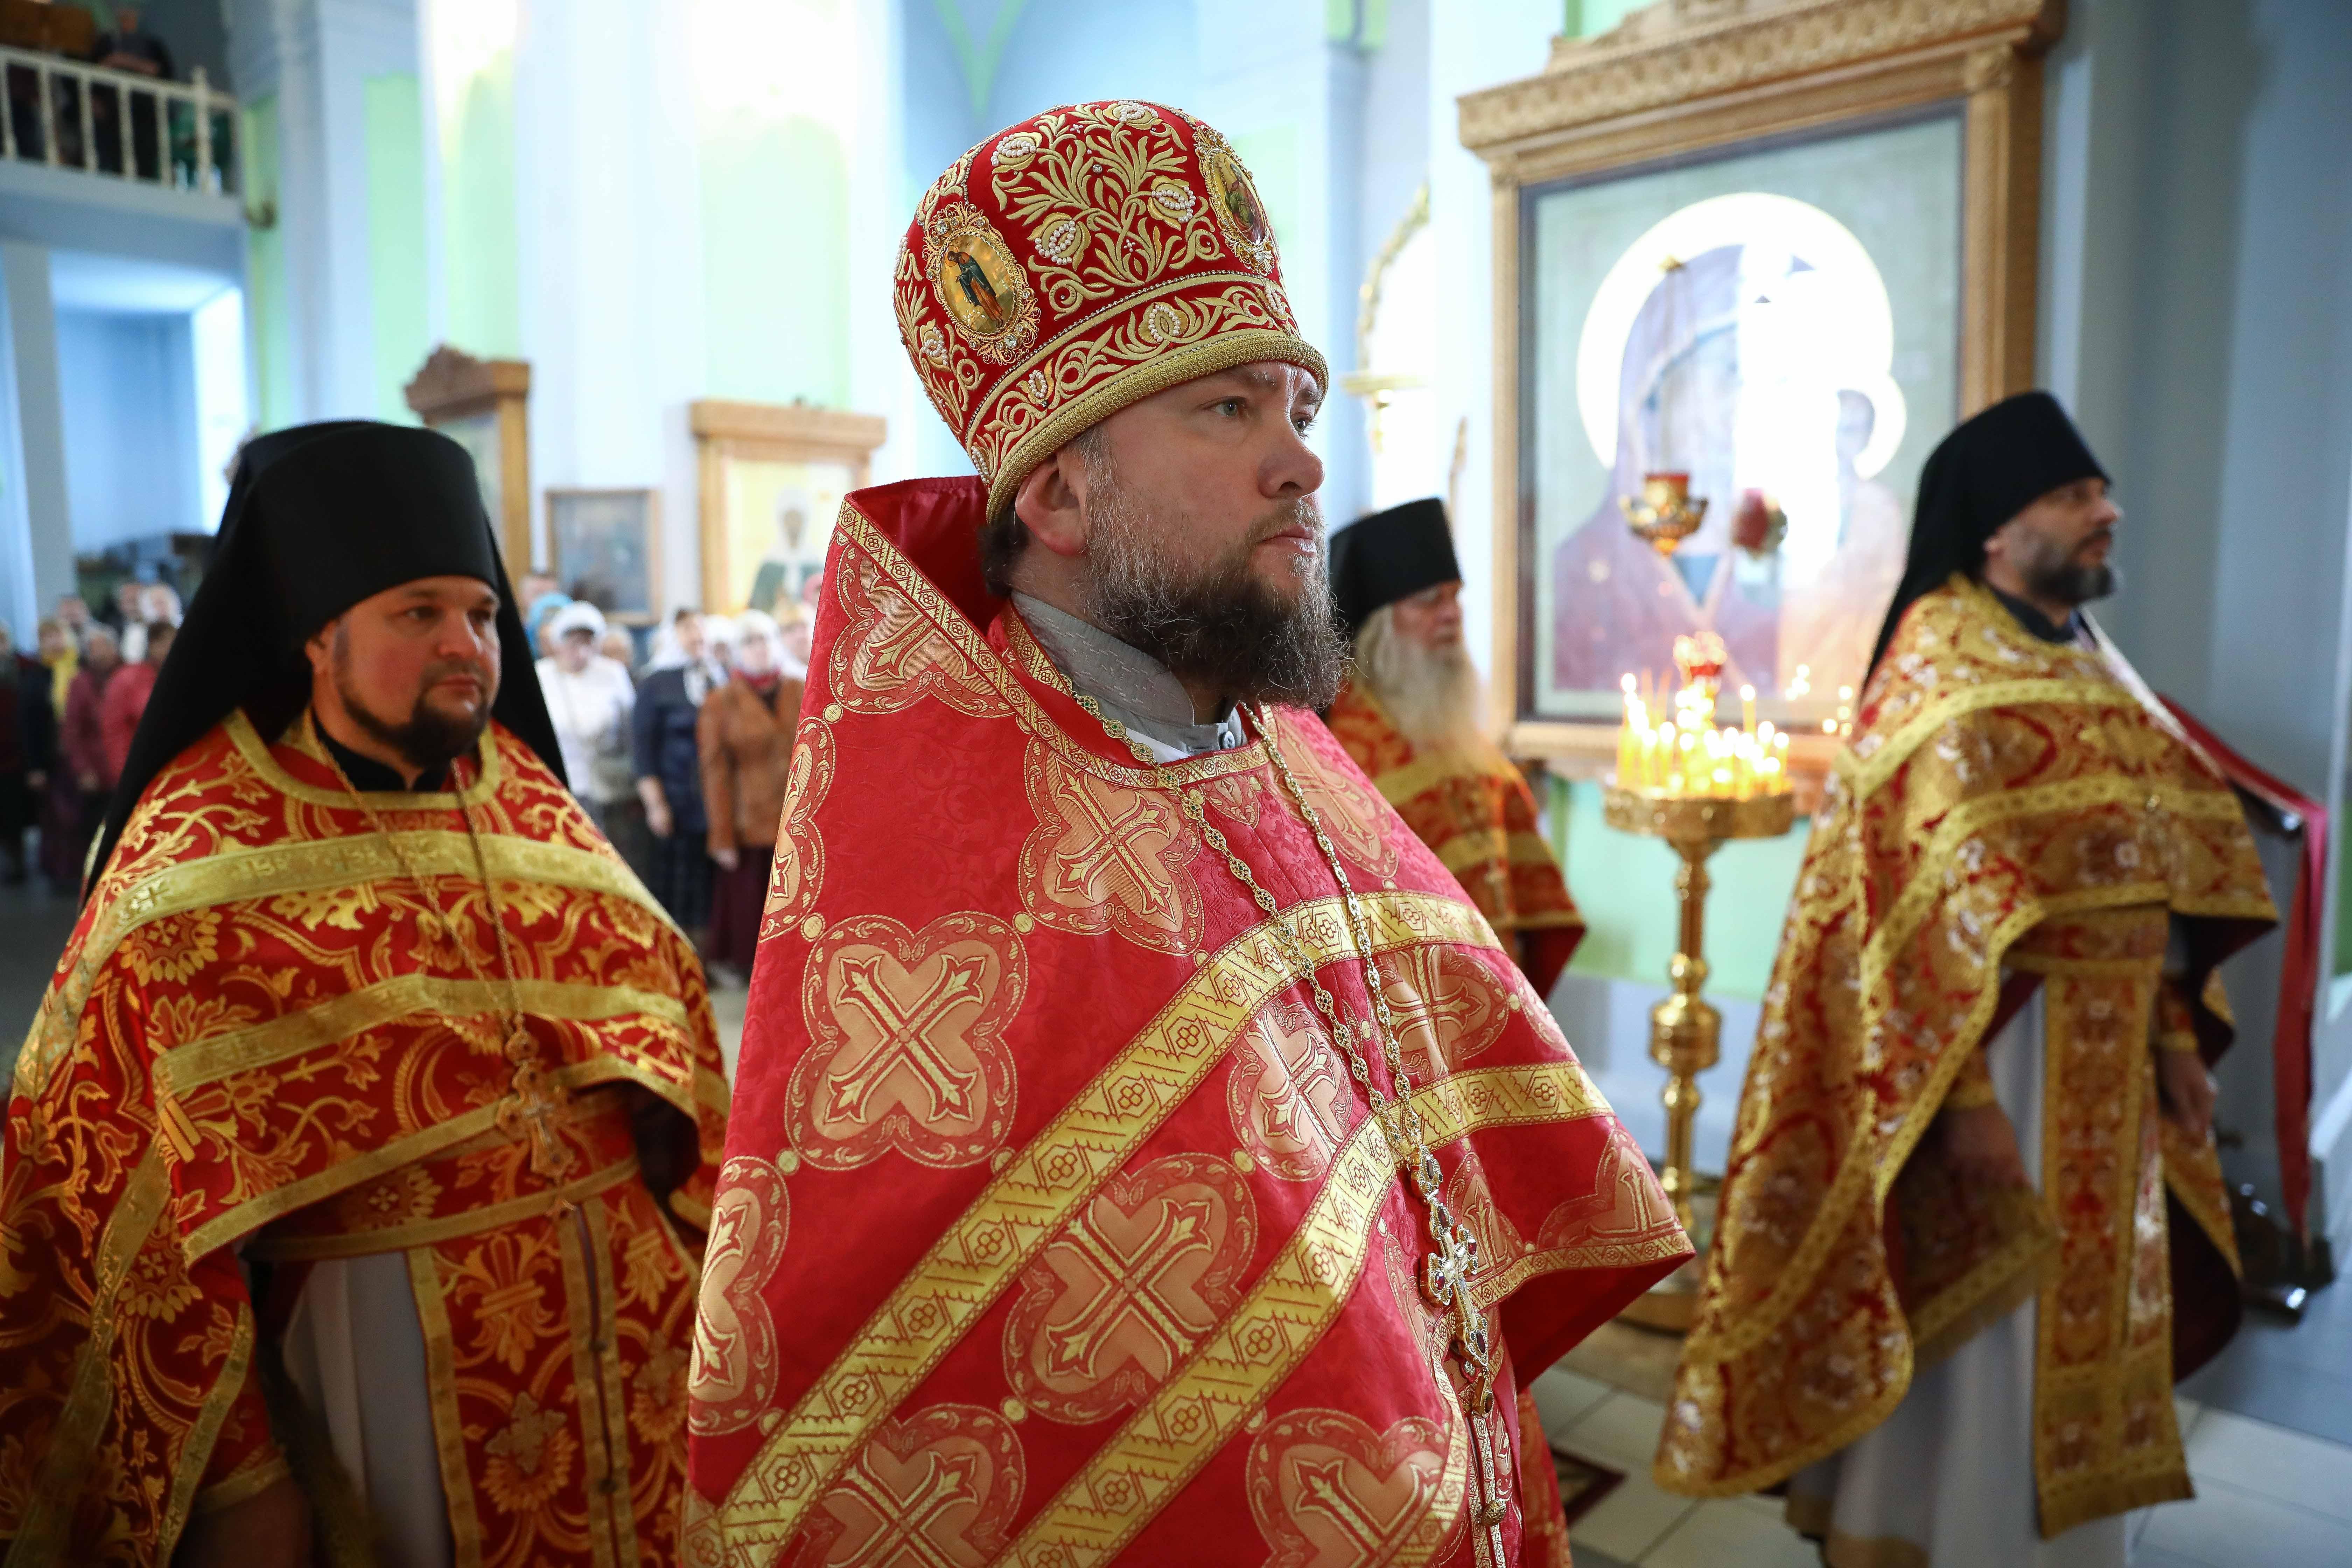 http://monuspen.ru/photoreports/6fe34d0b1744123e0a9091cd842914bh.jpg